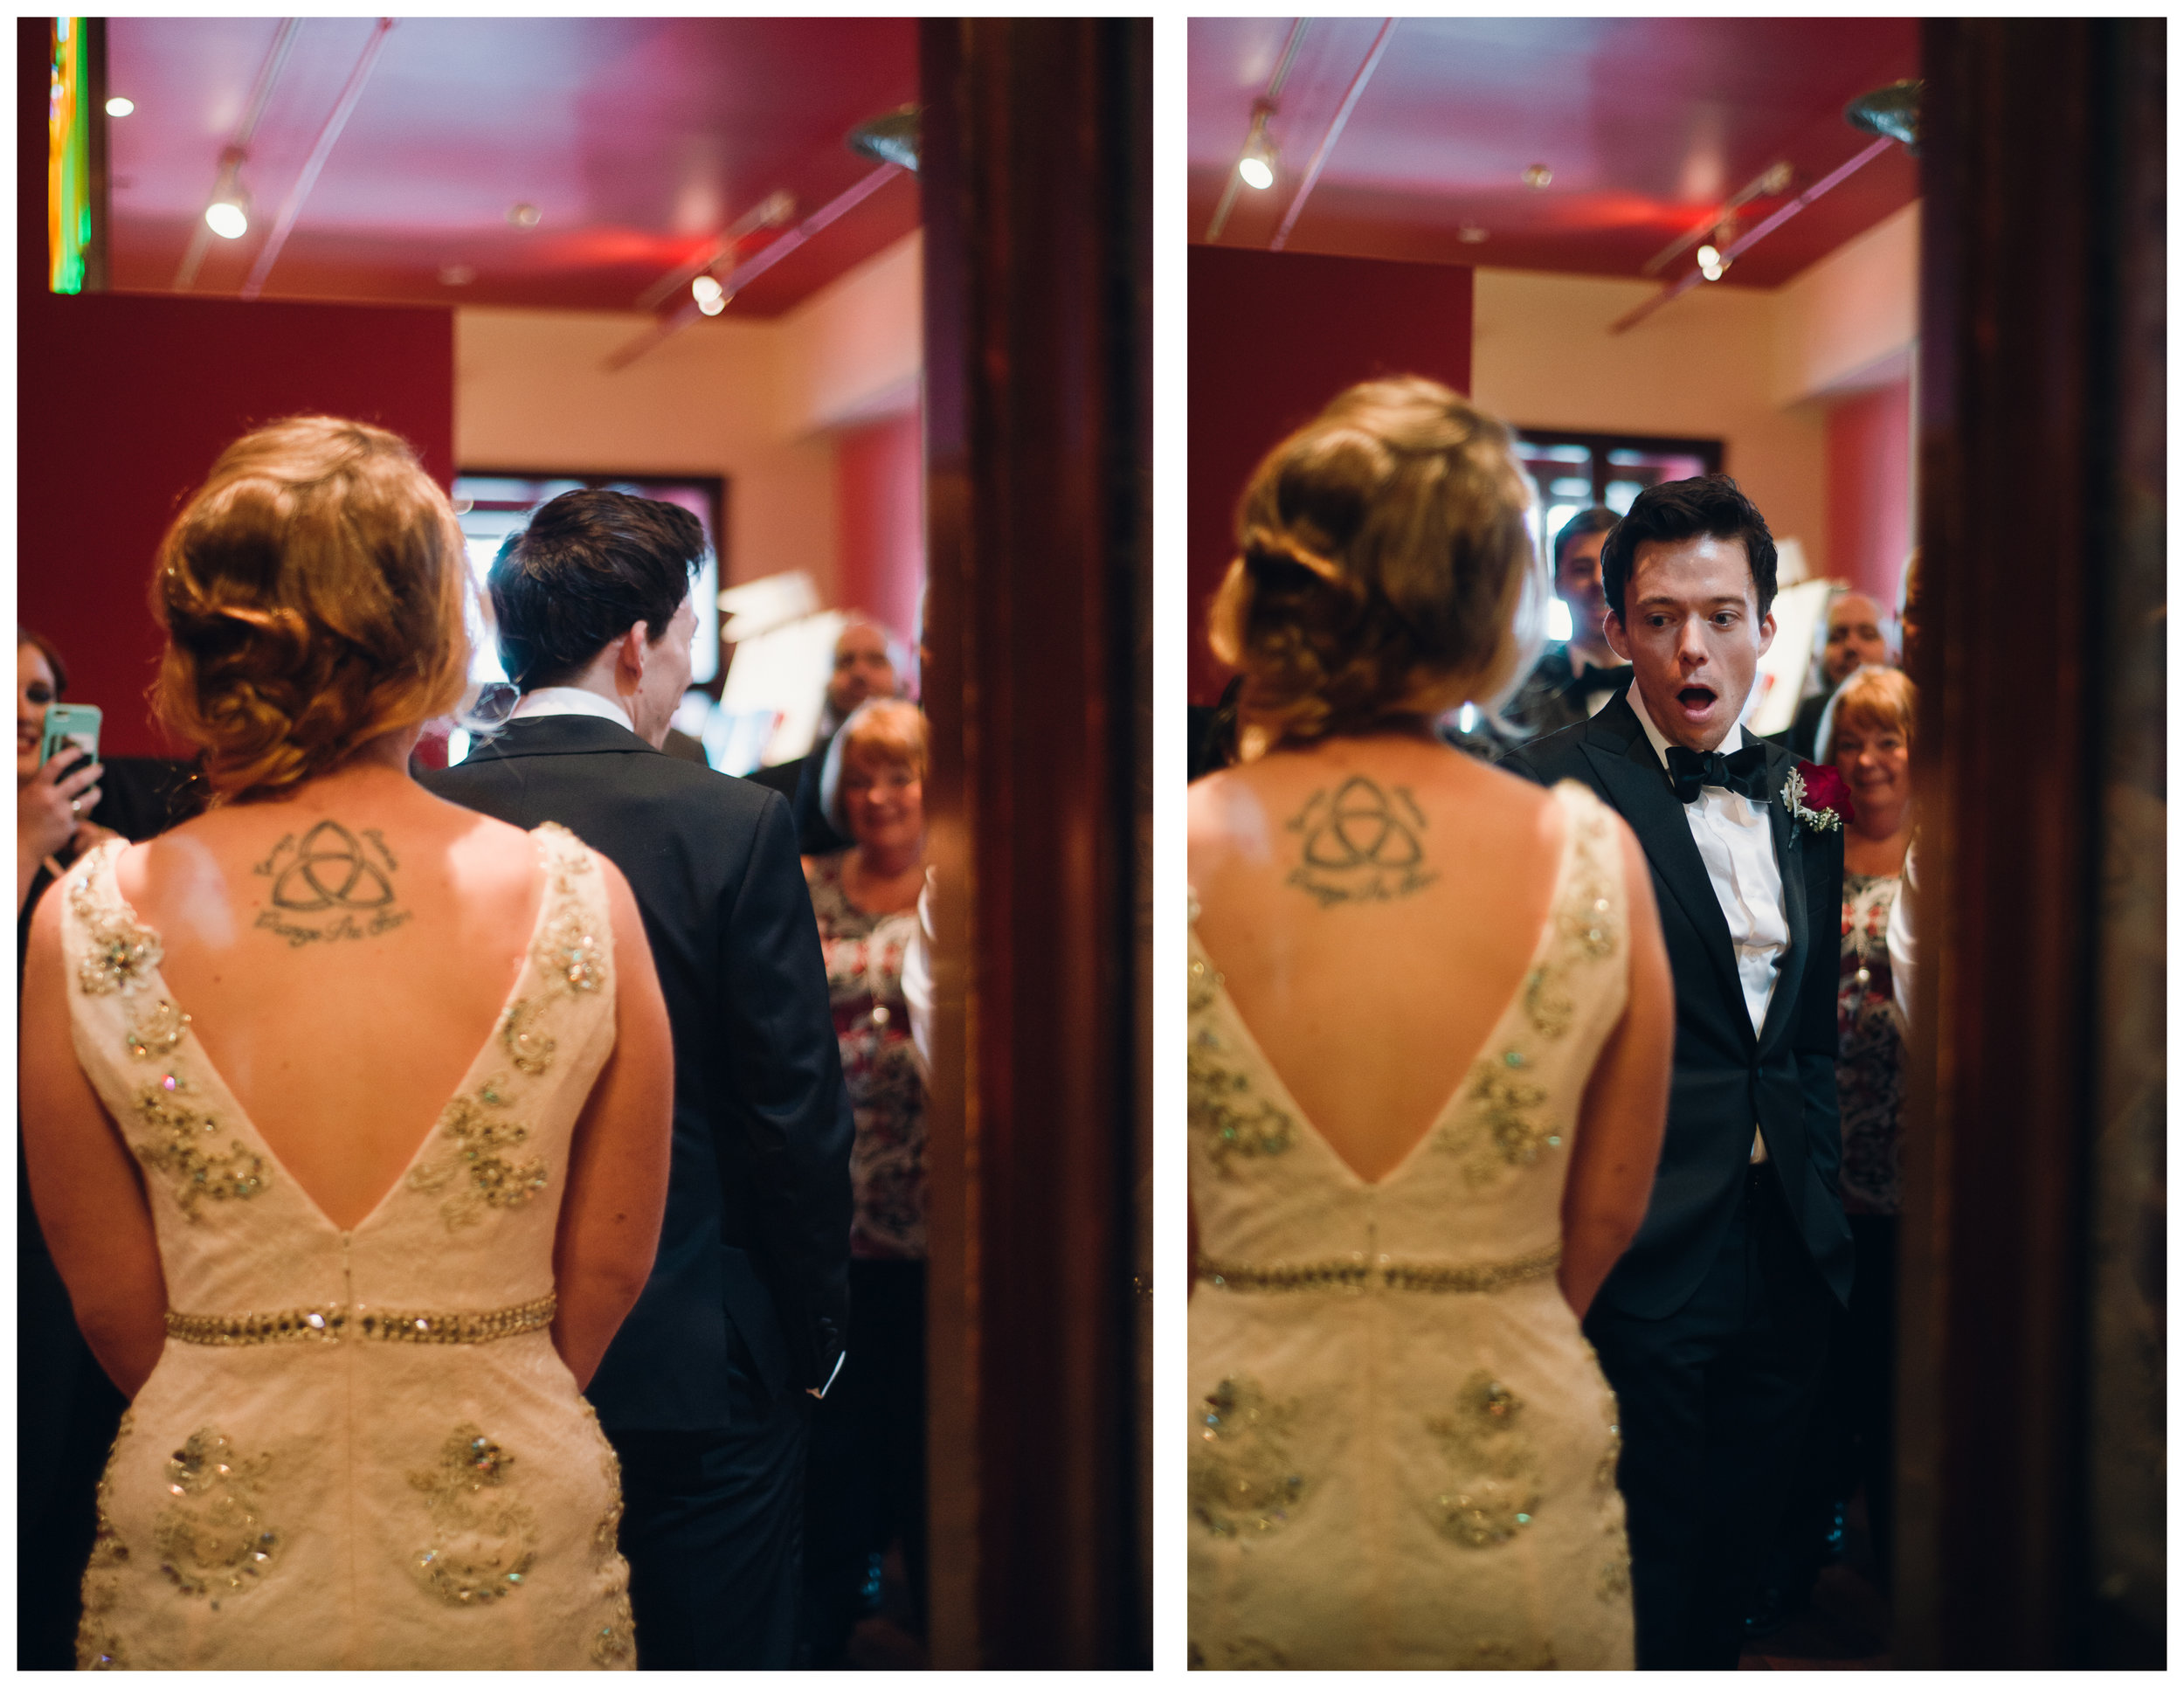 Gladstone Great Gastby Wedding 2x2_8.jpg